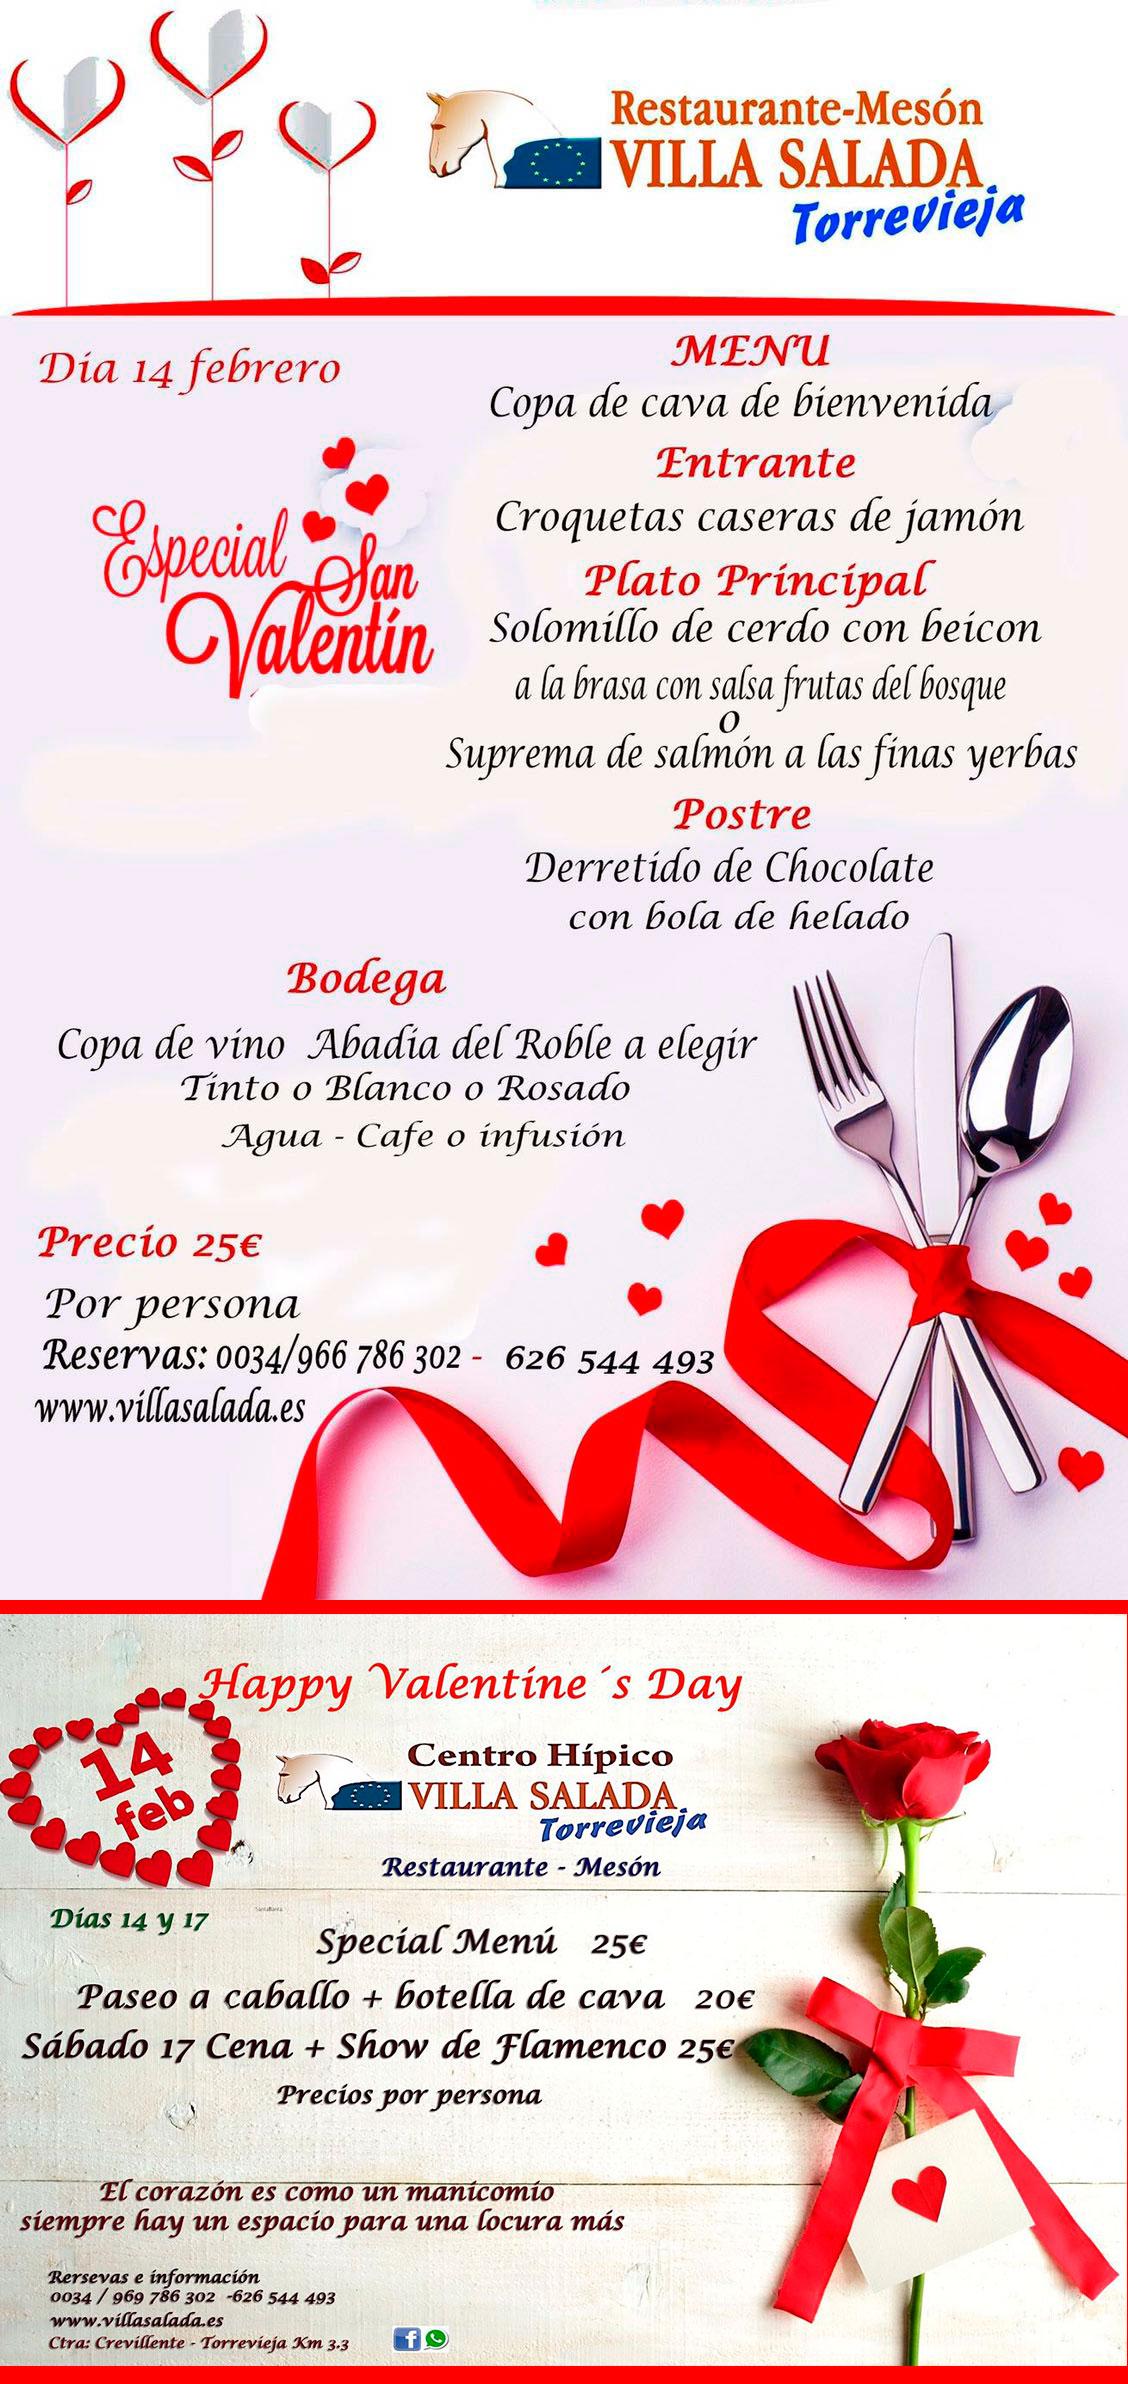 Persona 3 Valentines Day